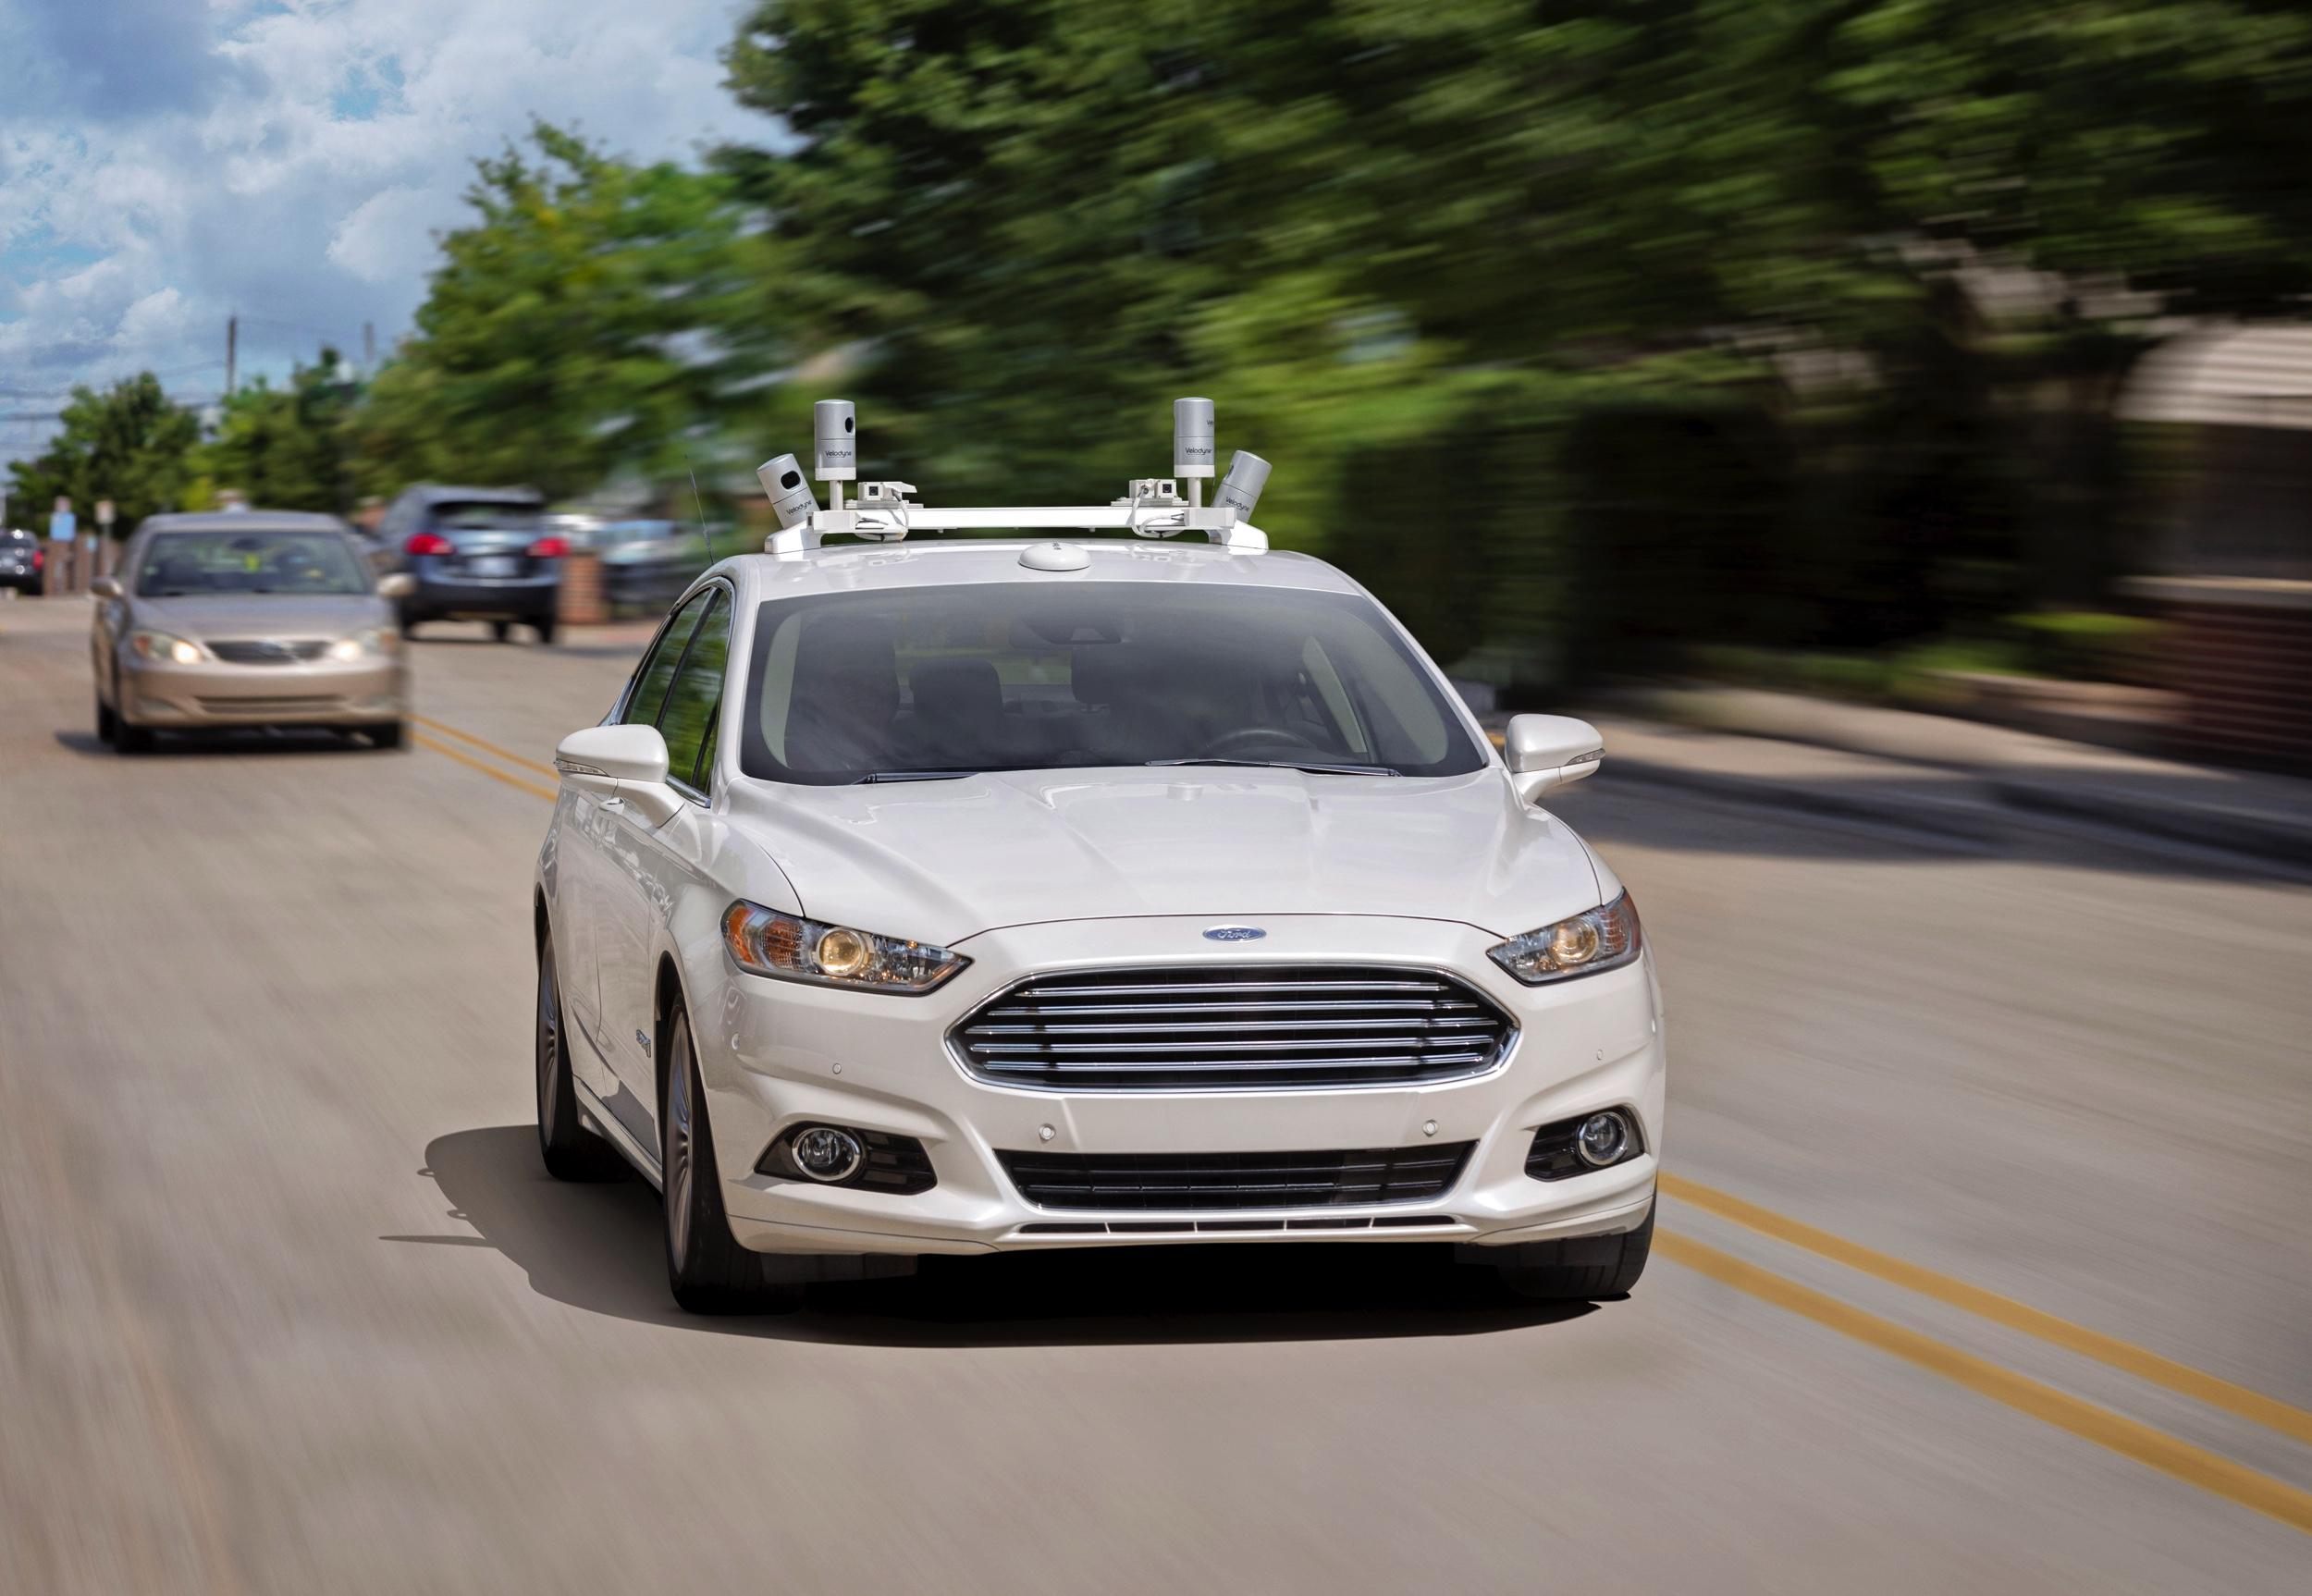 3-Ford Fusion Hybrid Autonoom rijden test - Autovisie.nl